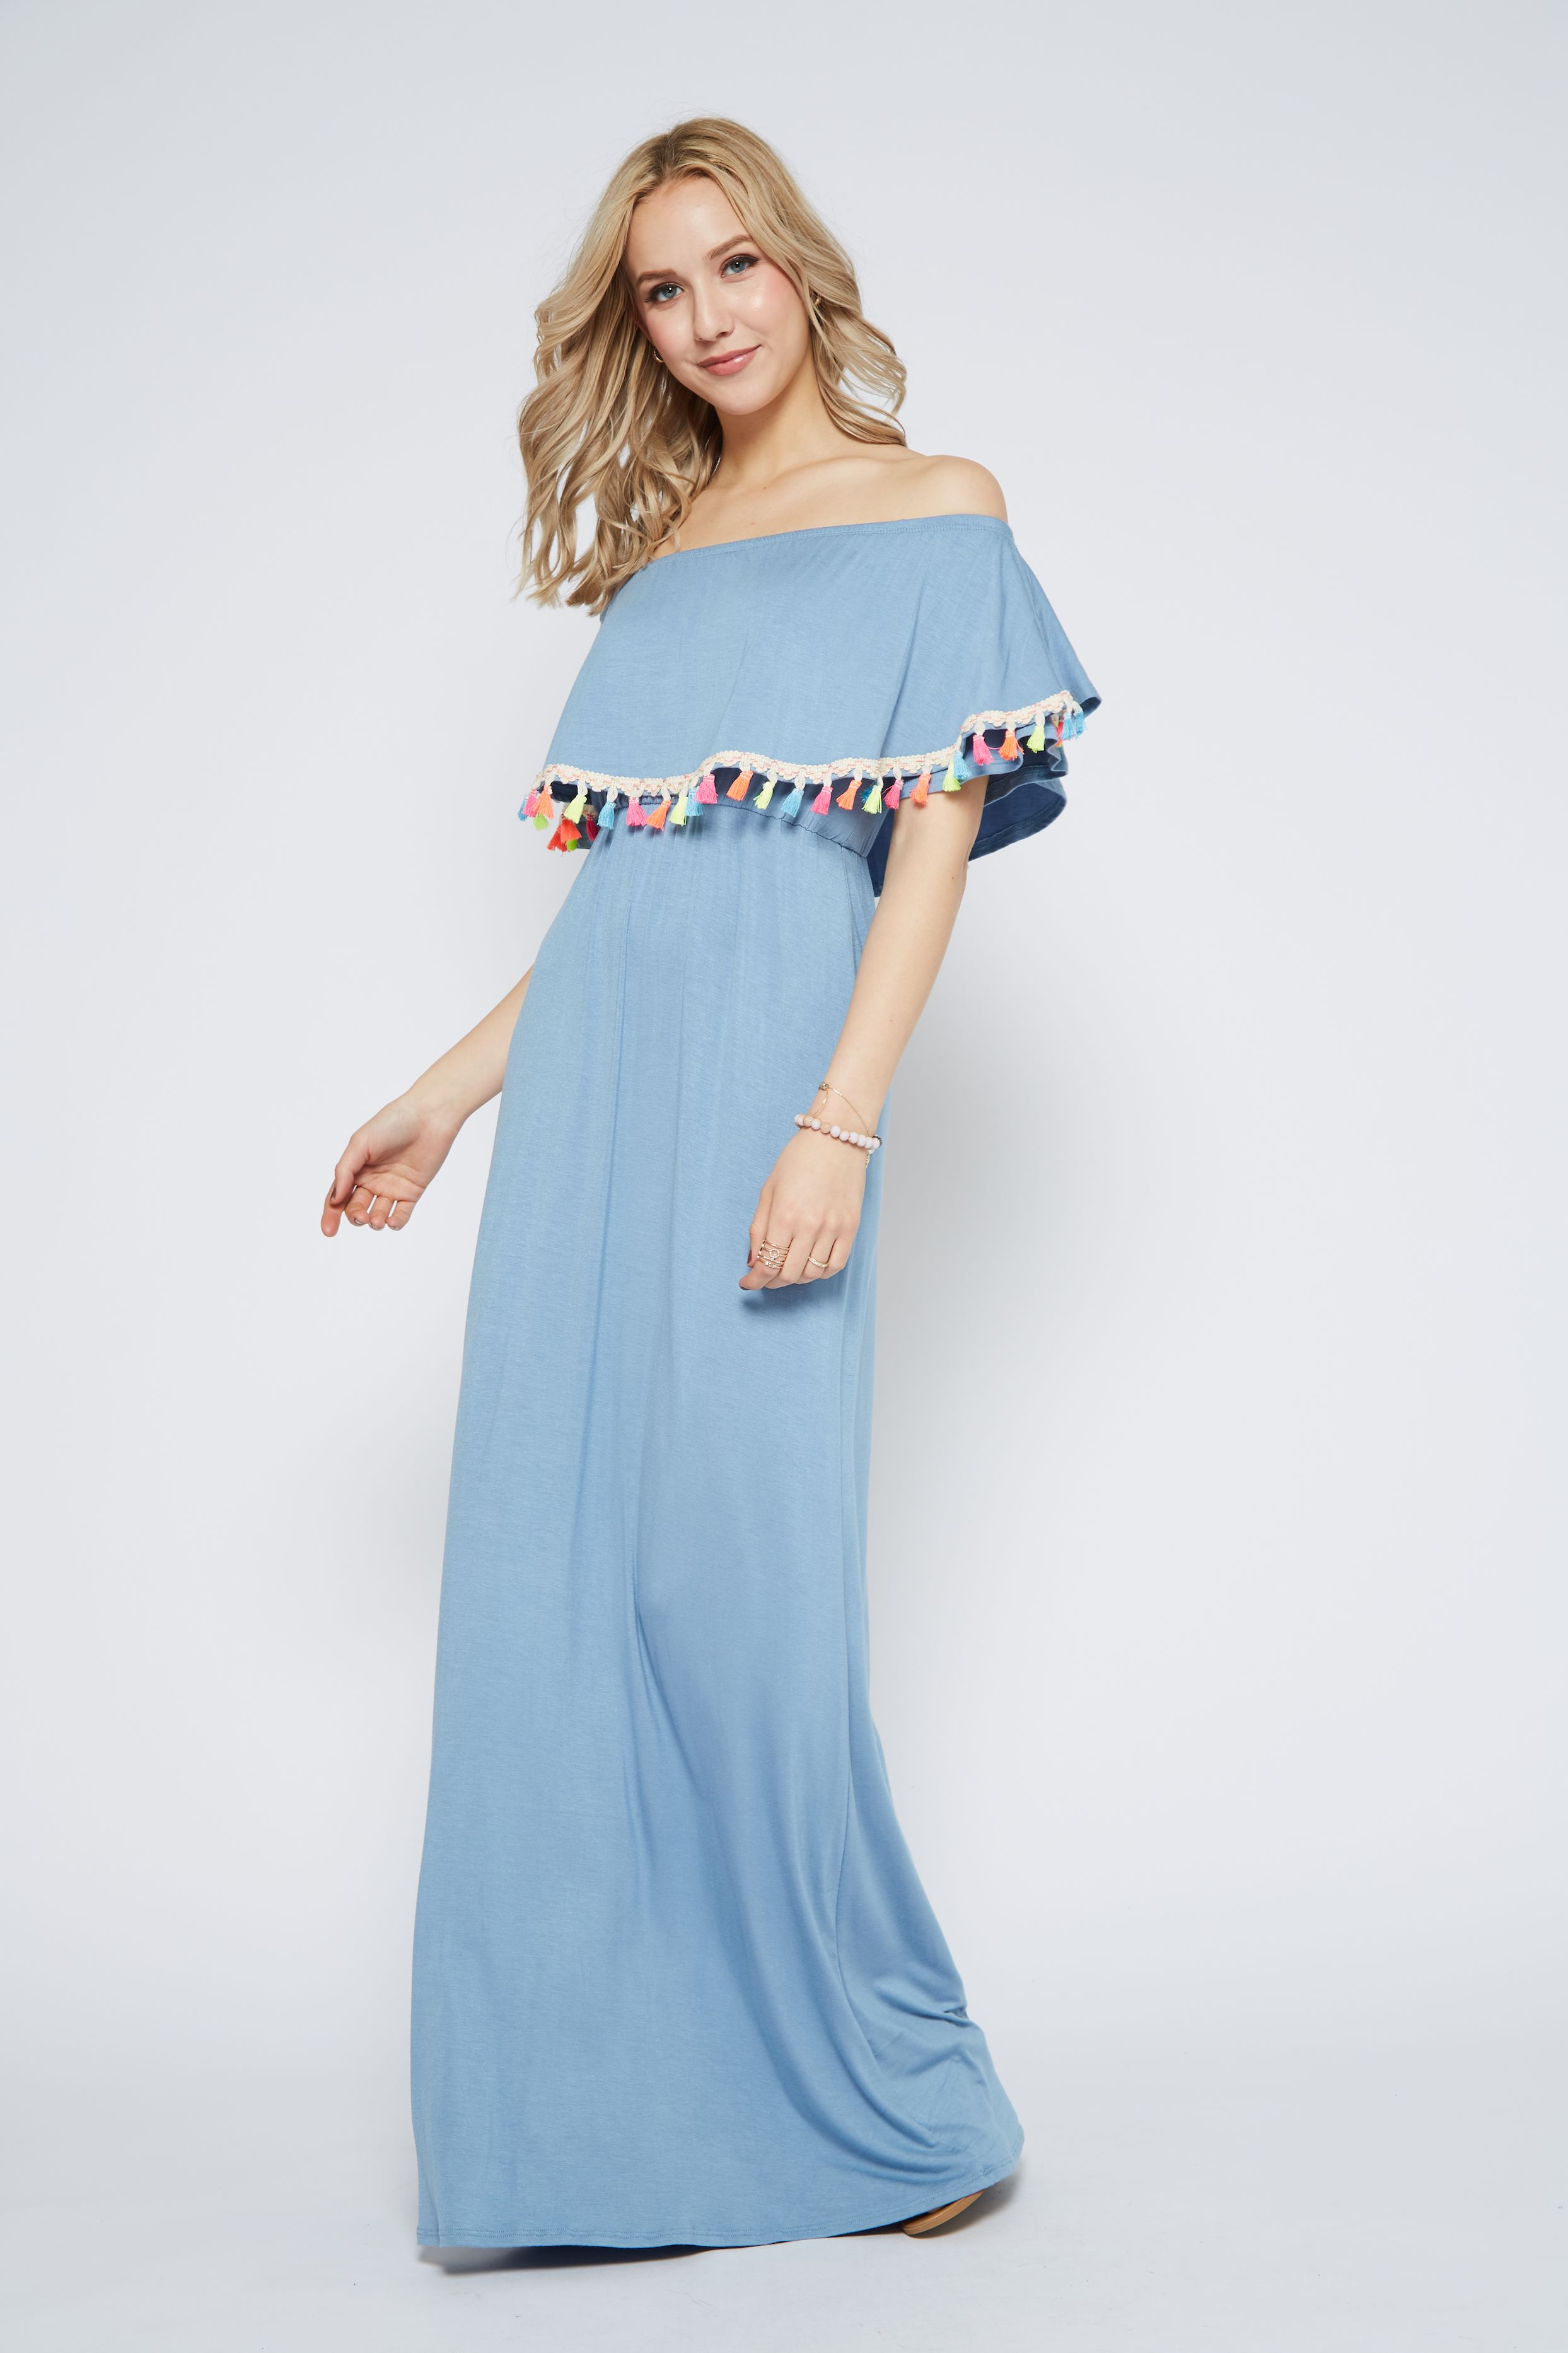 4b587472dceaa $42 Pom Trim Off Shoulder Dress | Maxi Dresses | Dresses, Off the ...